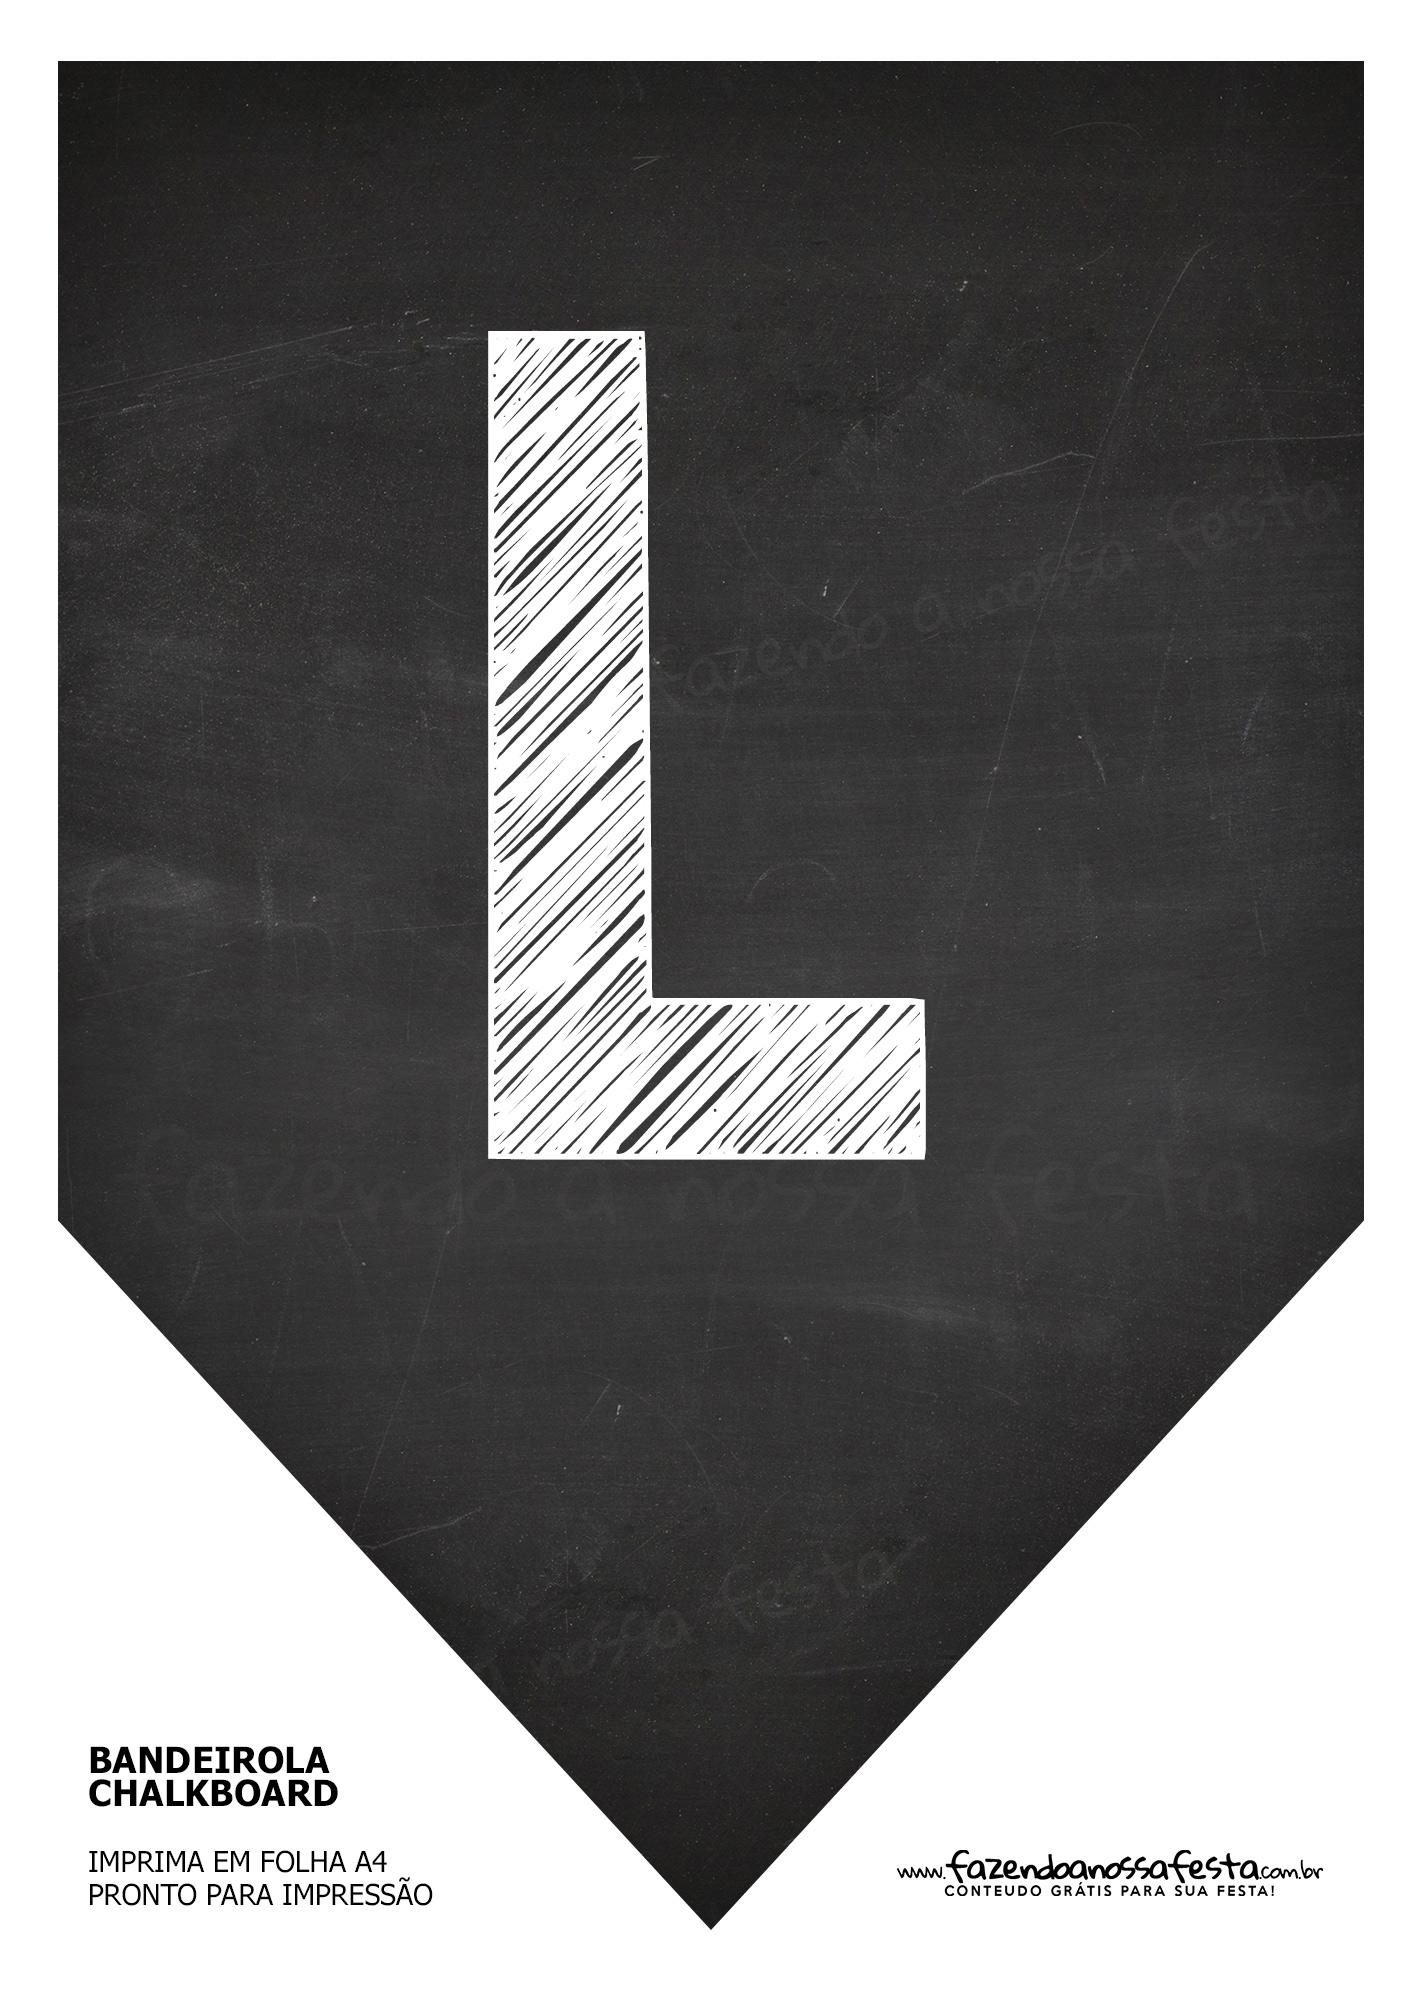 Bandeirinha Chalkboard L